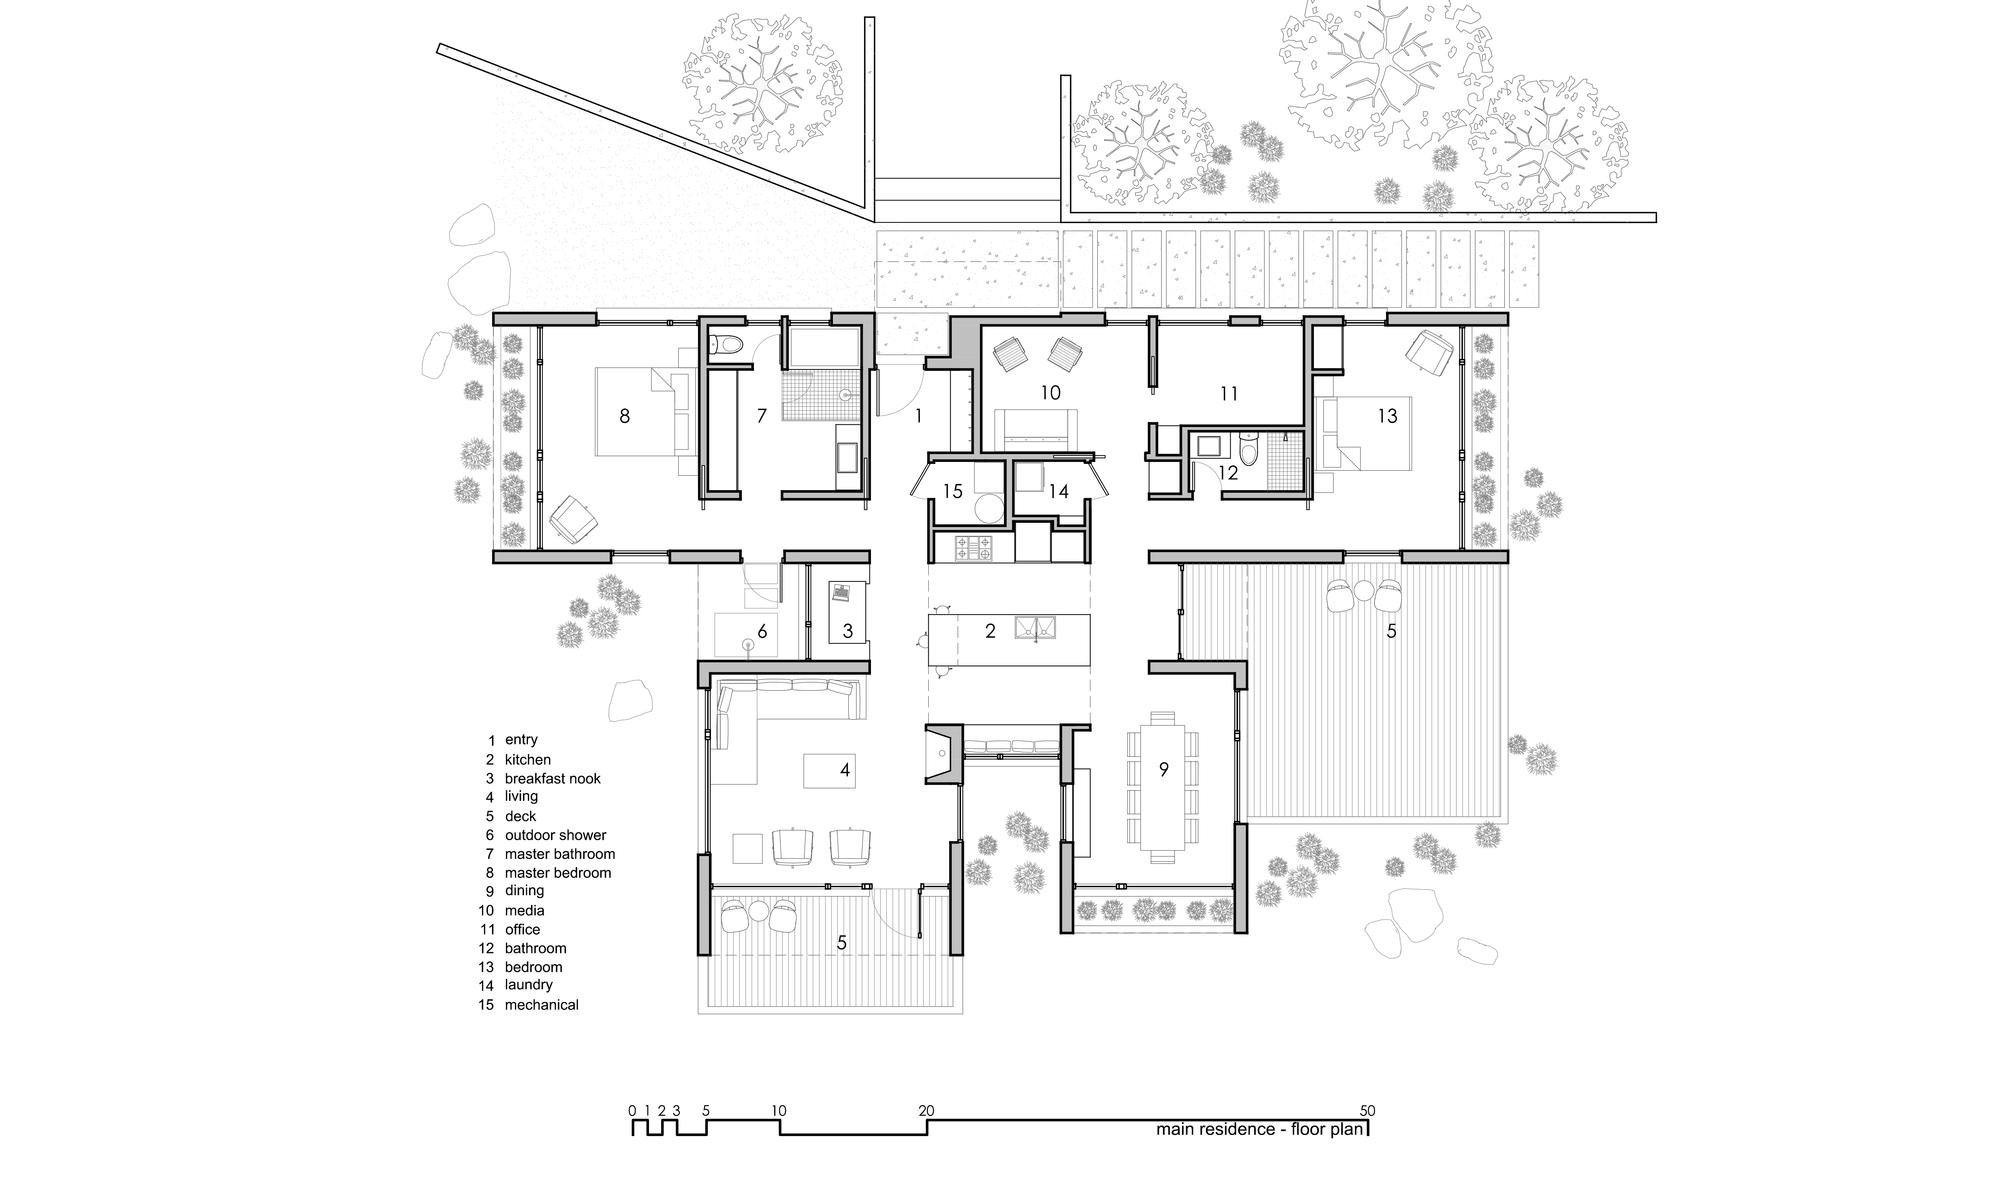 5522fd48e58ecea11900006e_capitol-reef-desert-dwelling-imbue-design_31_main_residence_-_floor_plan